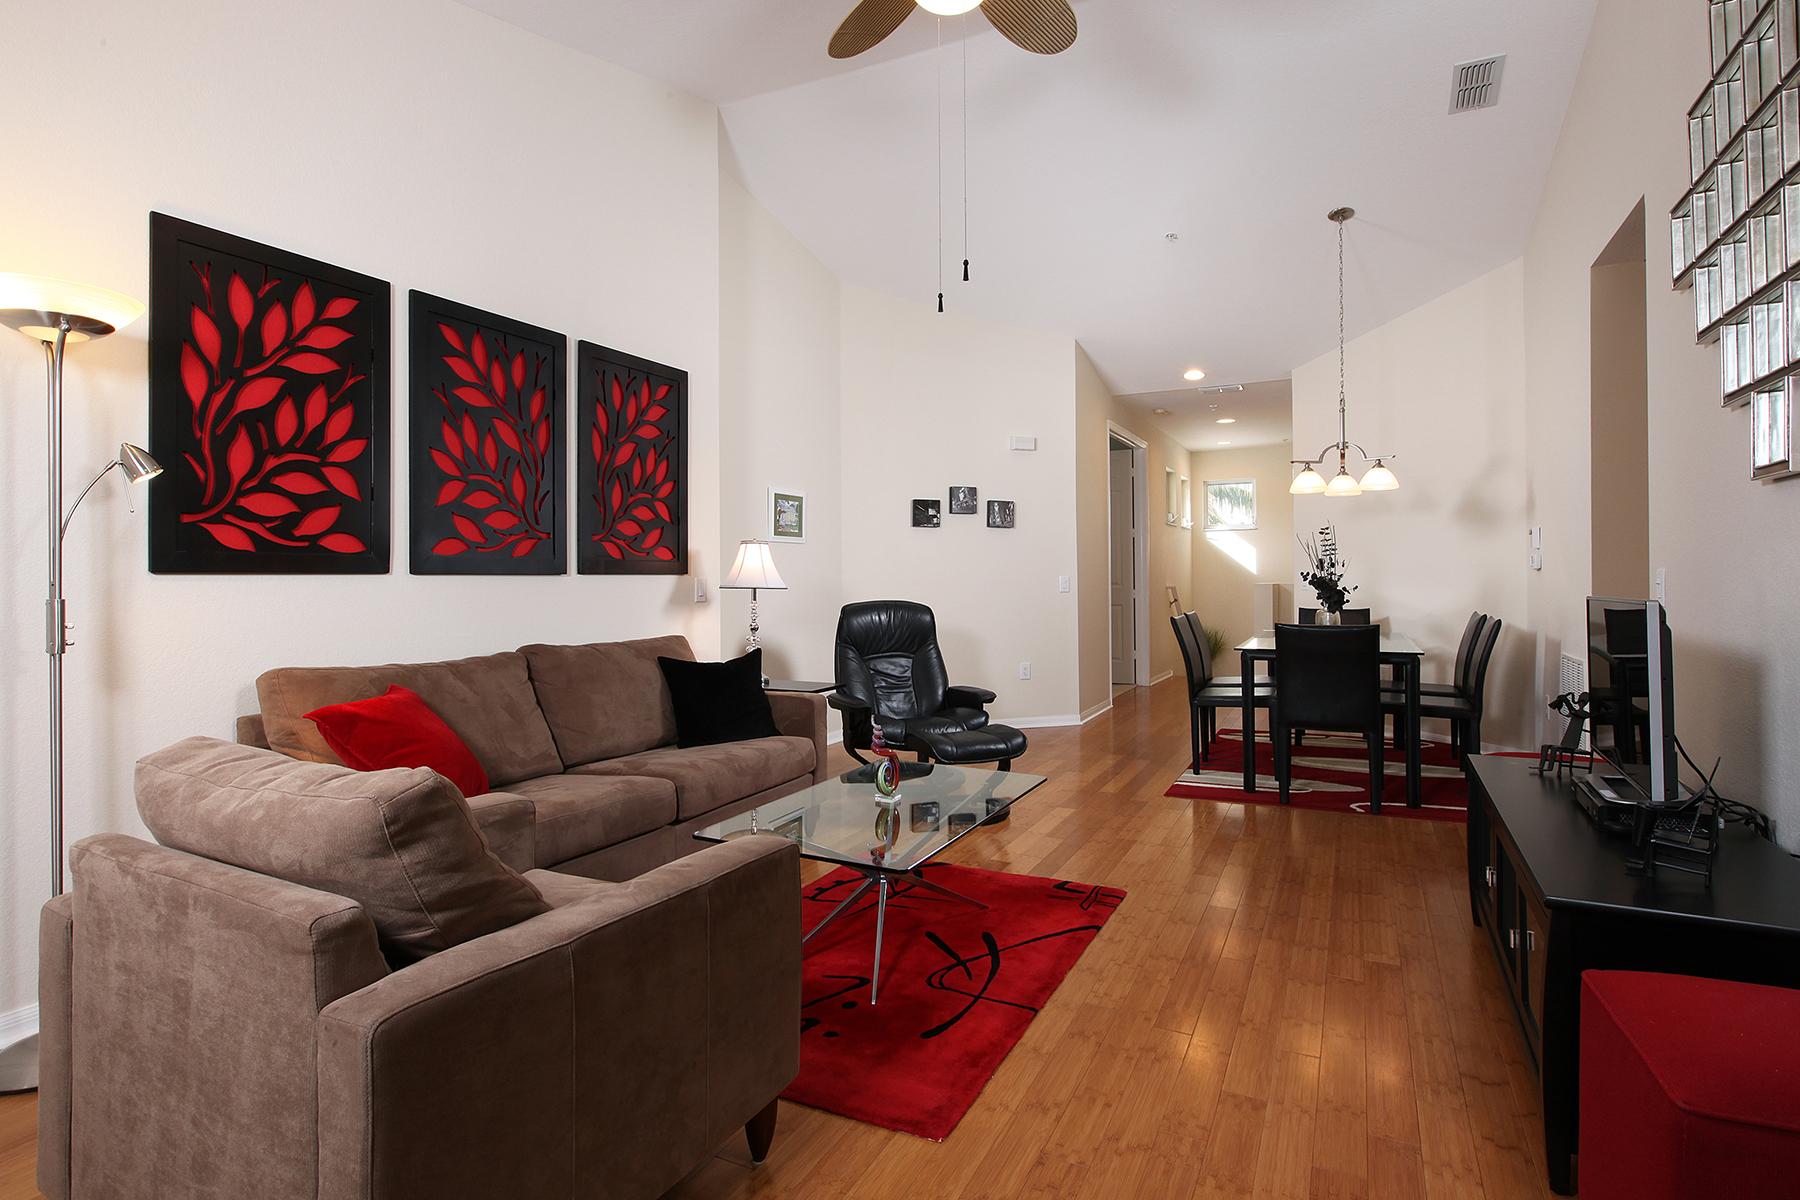 Condominium for Sale at FIDDLER'S CREEK - HAWK'S NEST 4660 Hawks Nest Way 201 Naples, Florida, 34114 United States